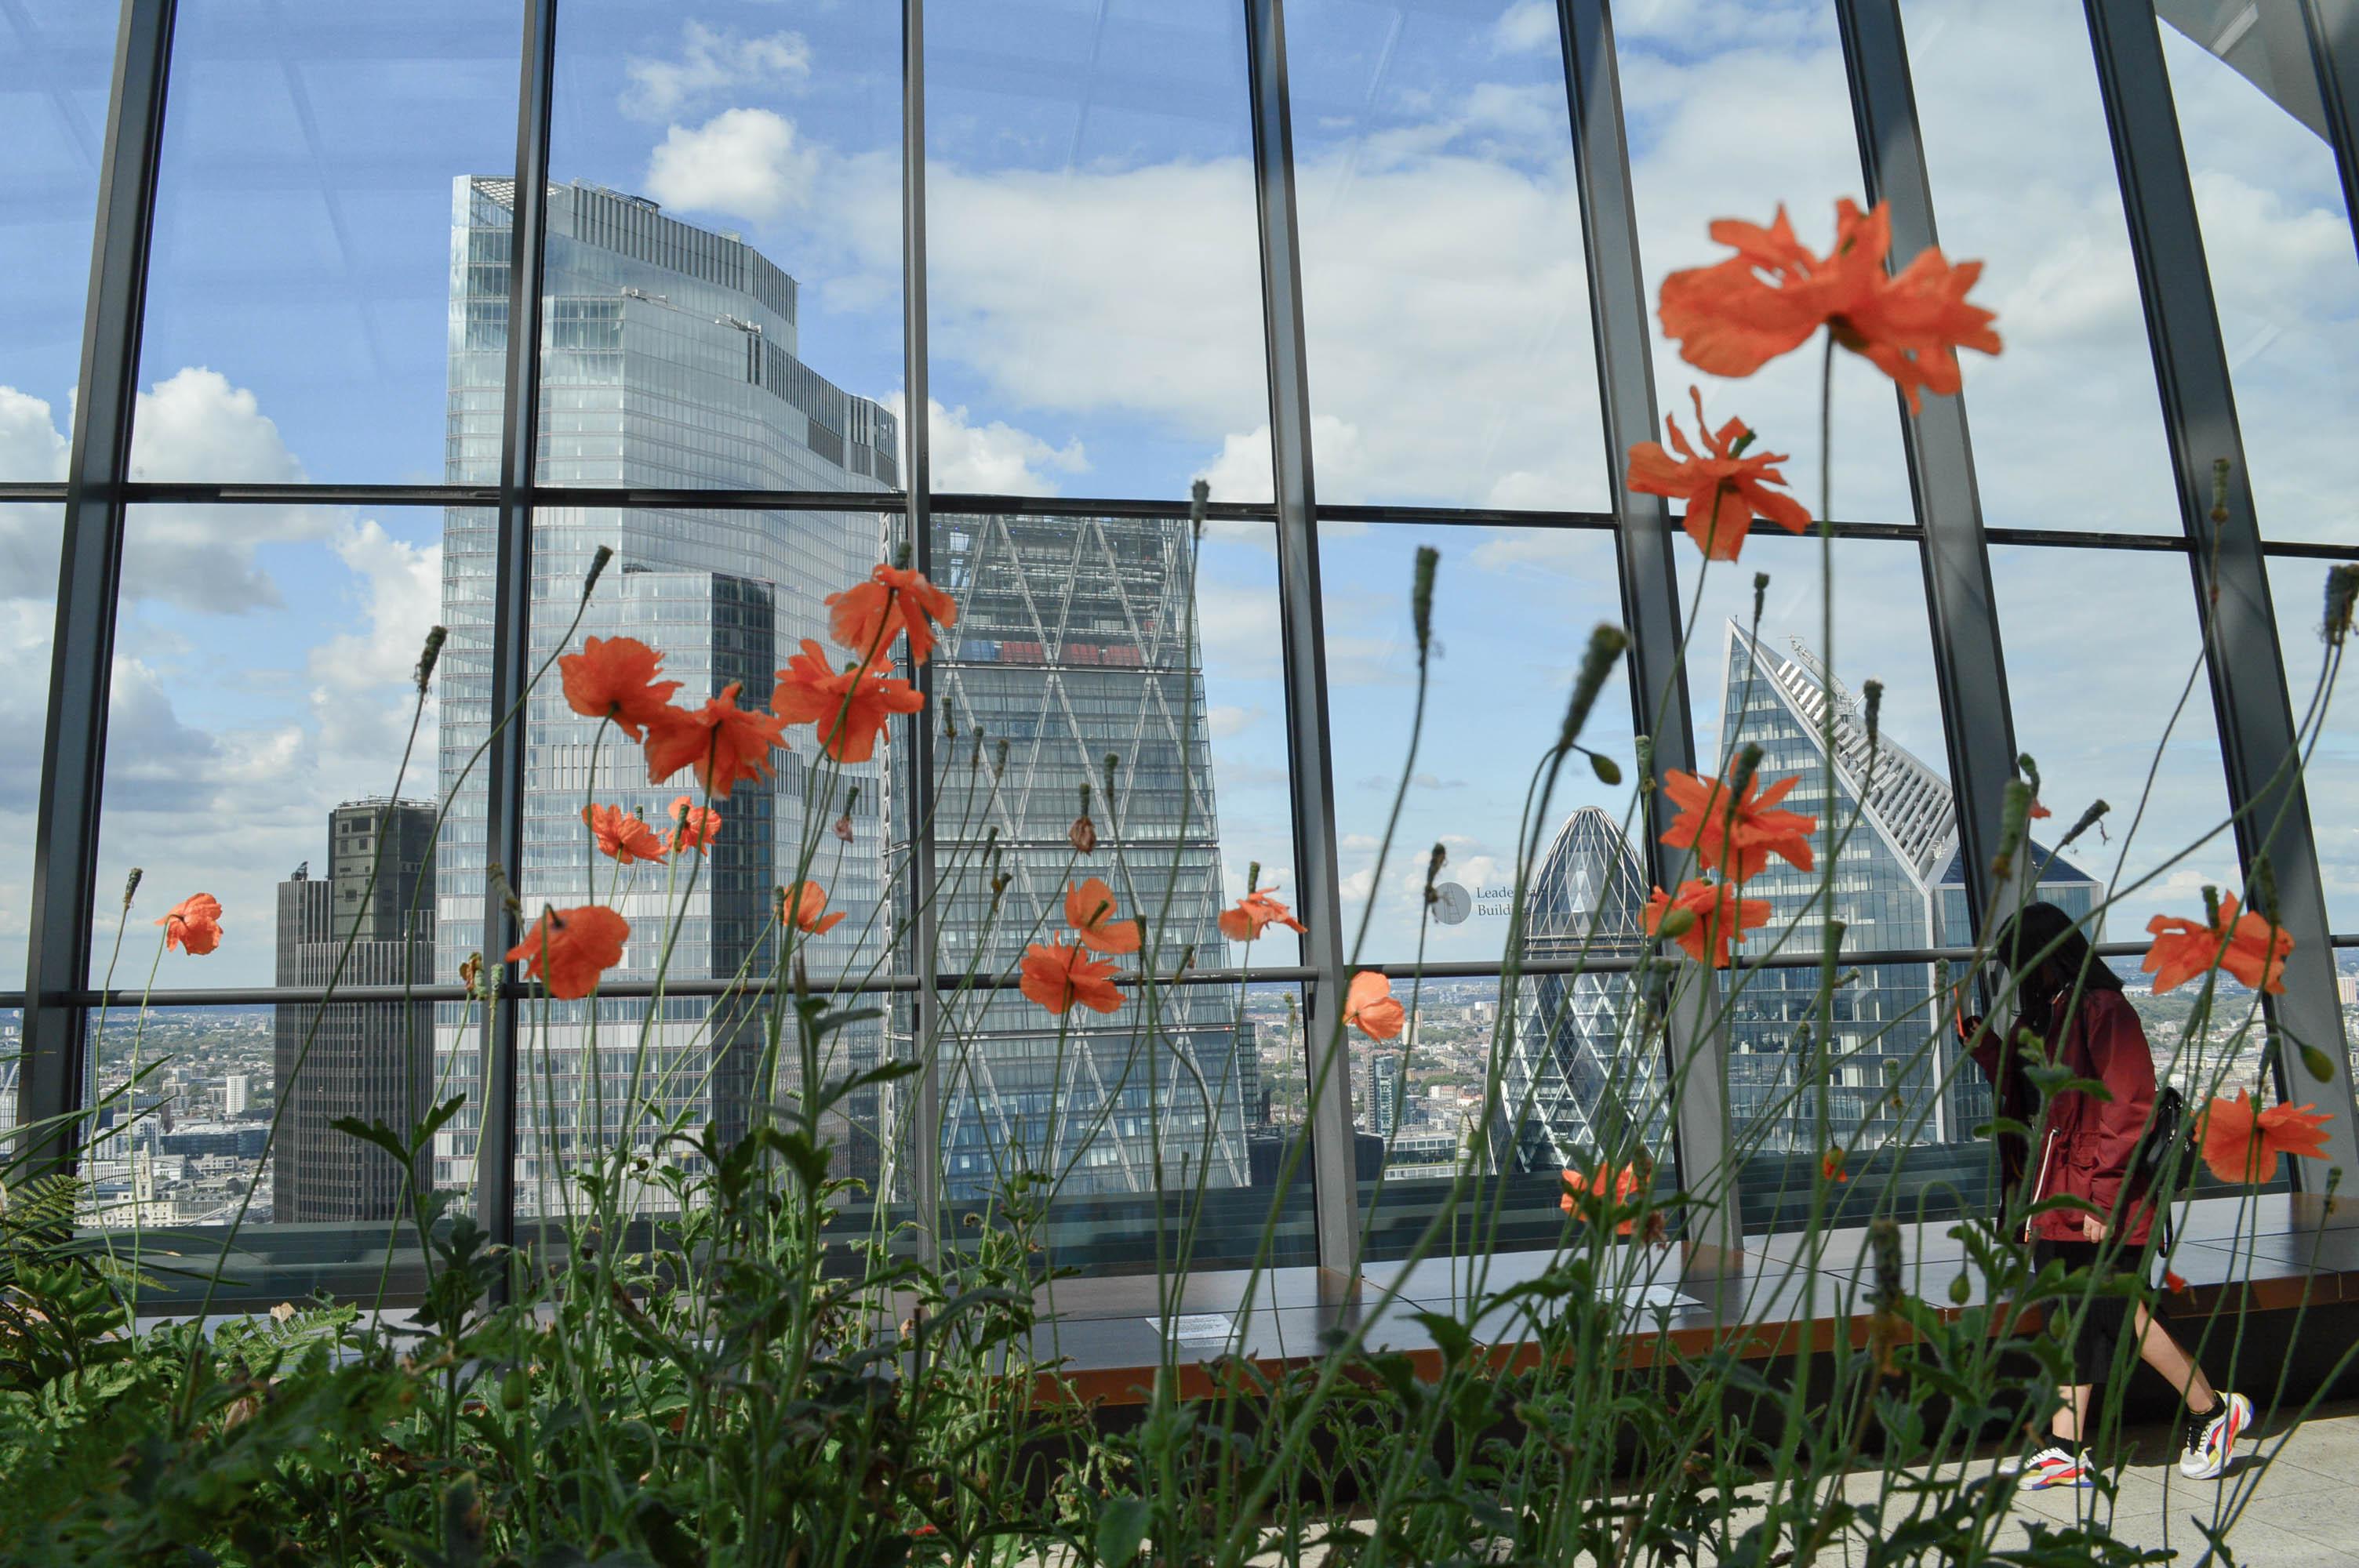 City of London skyline through the flowers